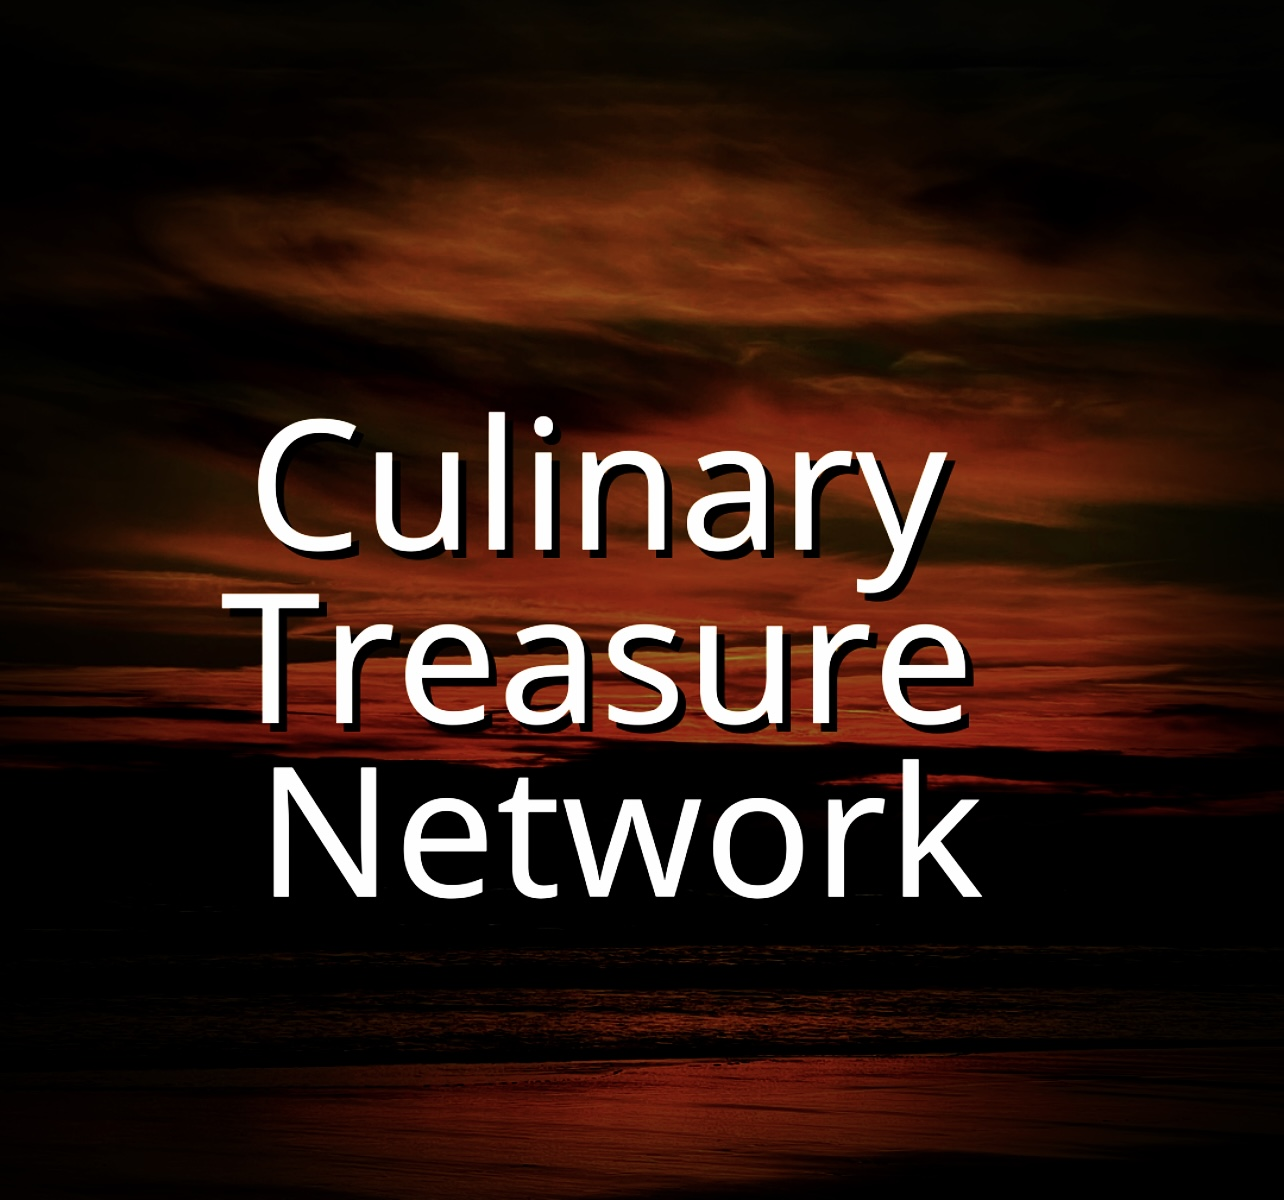 The Culinary Treasure Network